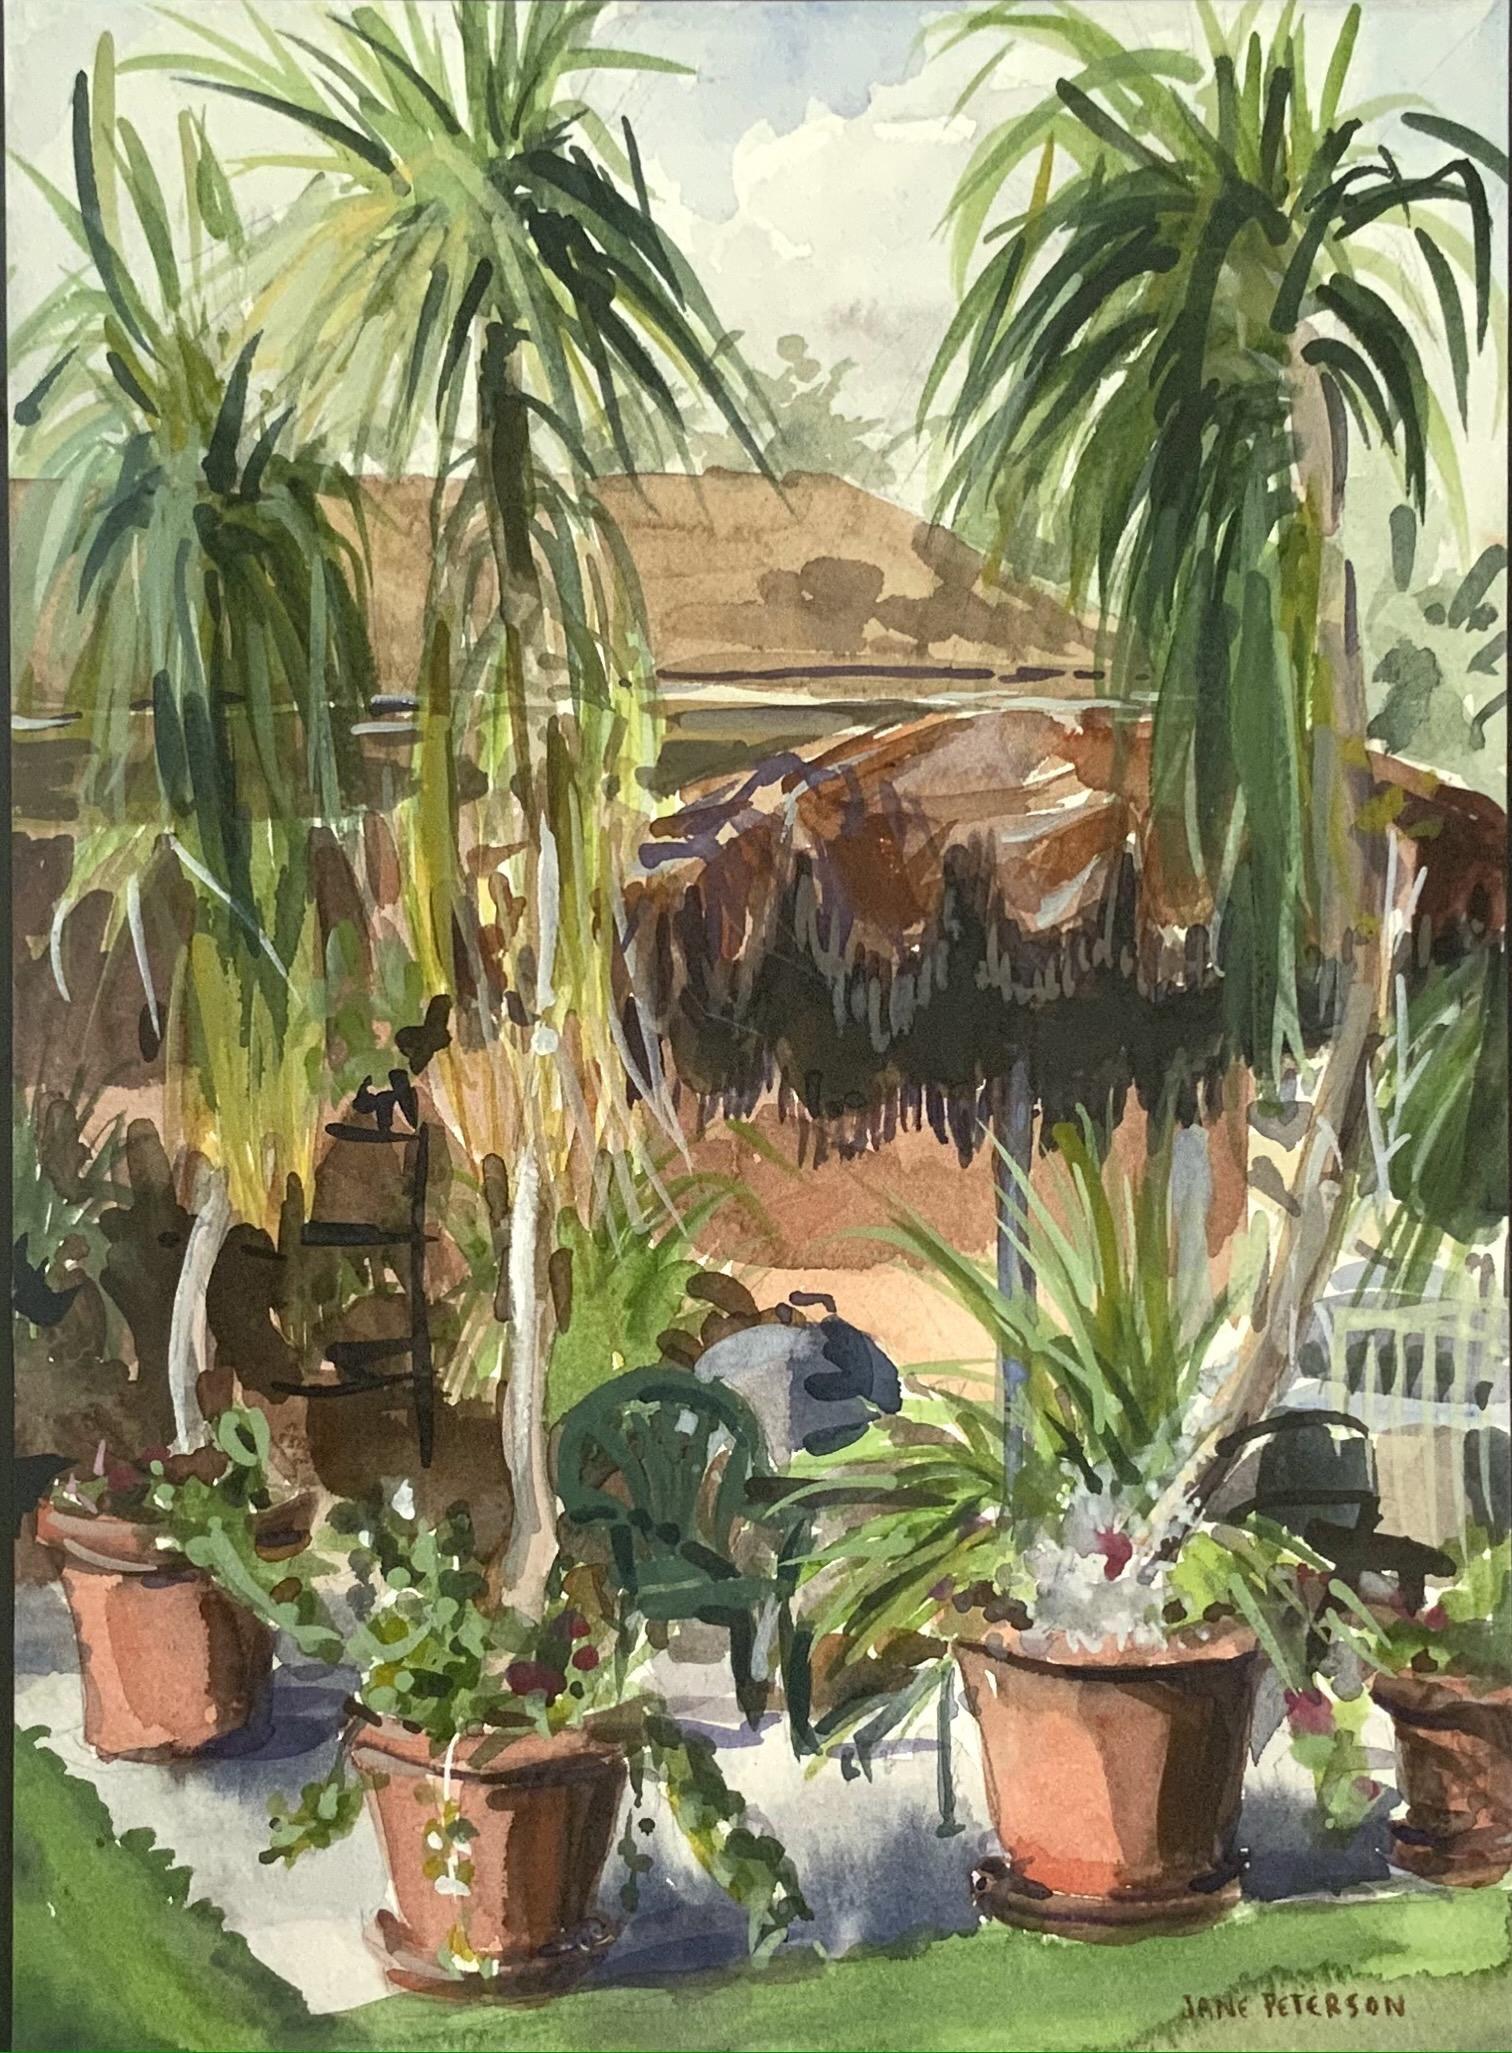 Sgd. Jane Peterson Watercolor.